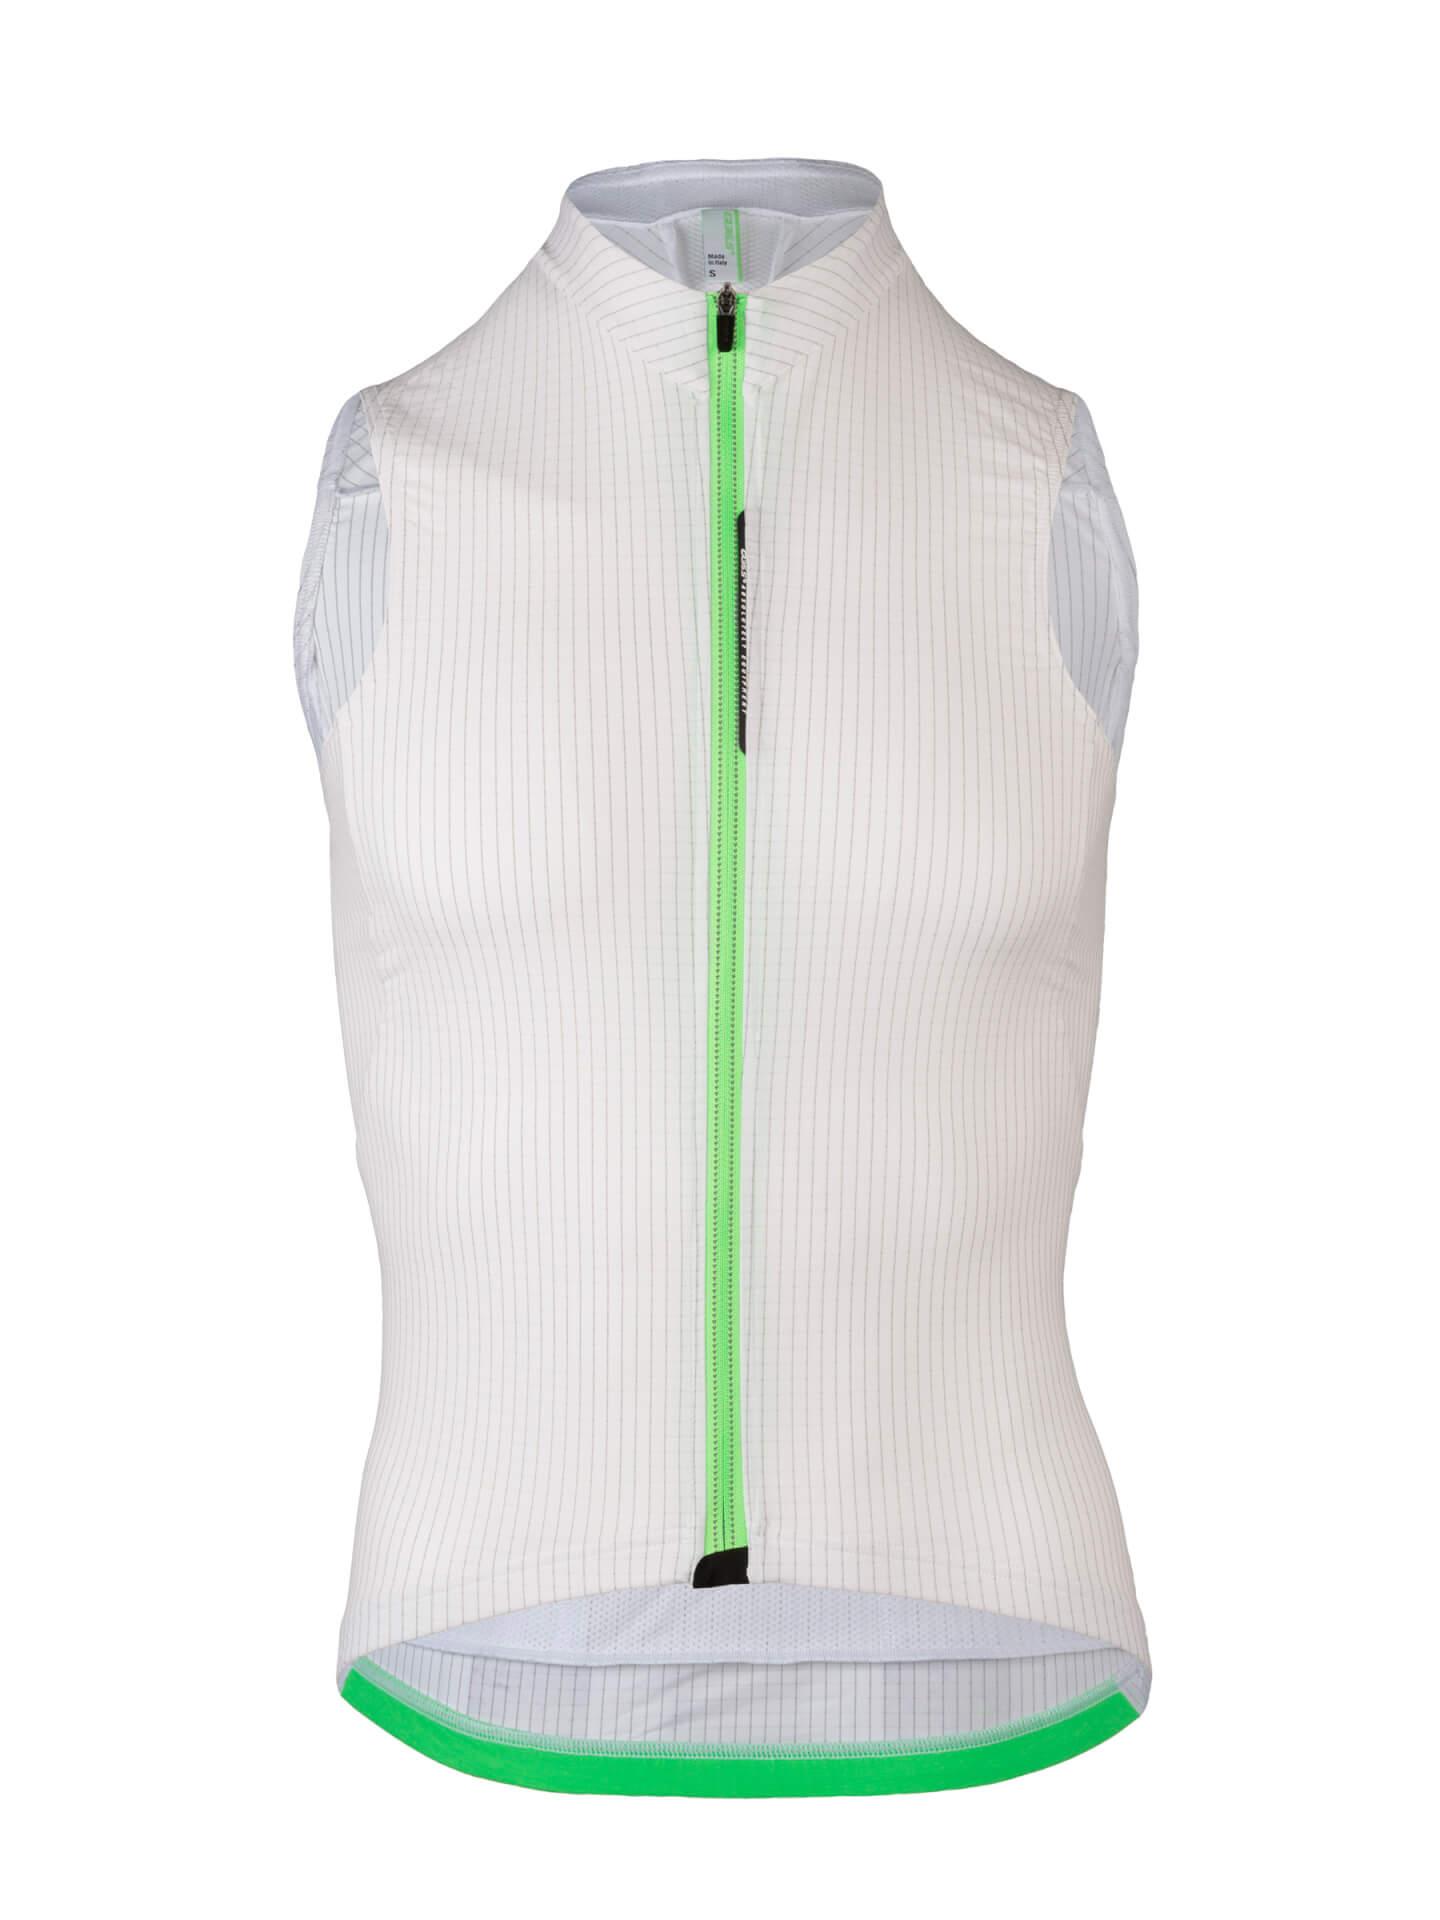 Cycling Jersey sleeveless L1 Pinstripe Q36.5 white - back